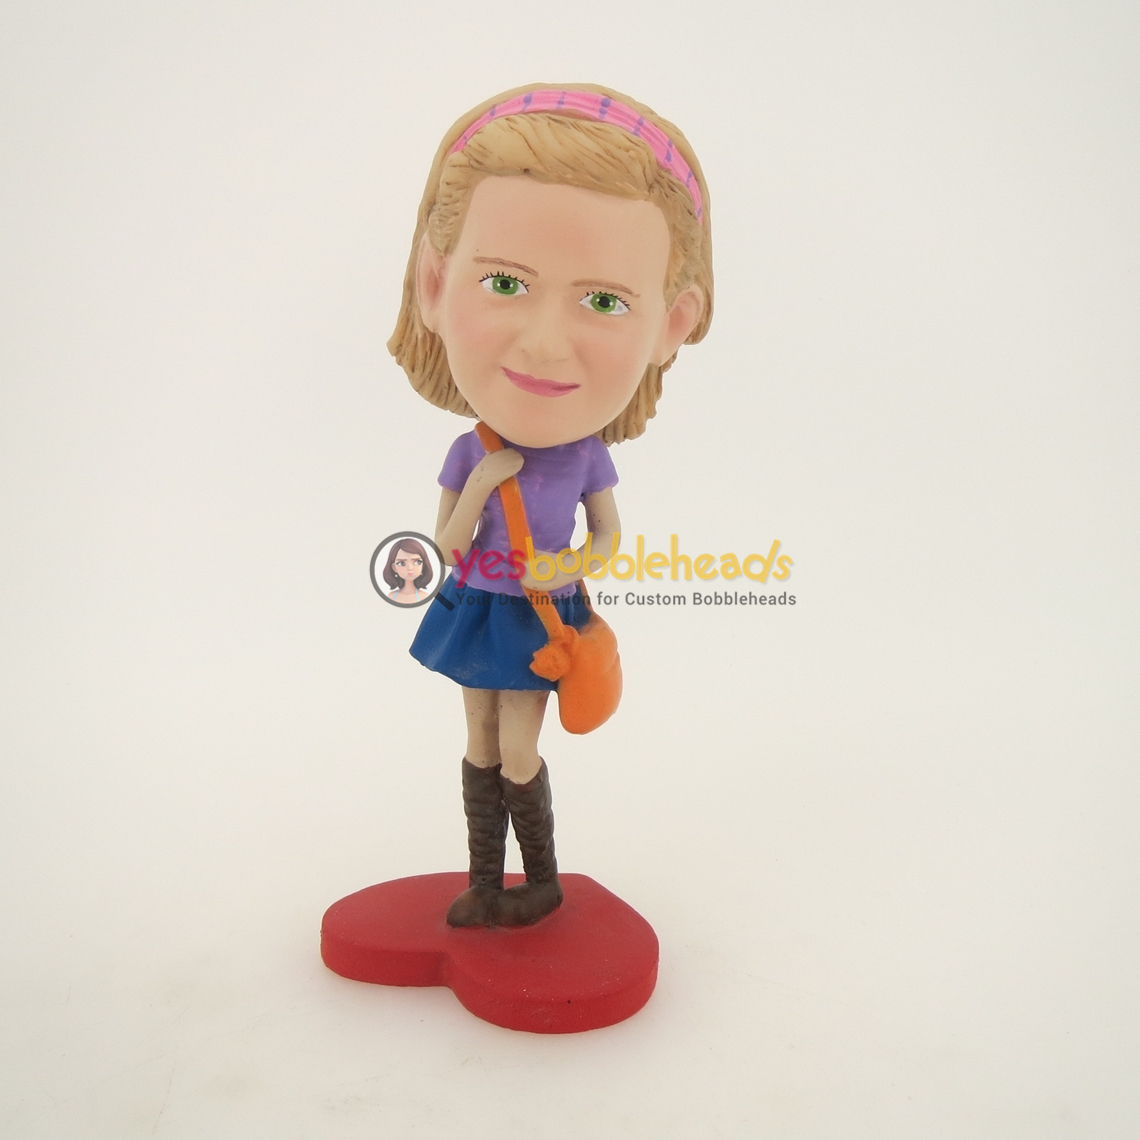 Picture of Custom Bobblehead Doll: Schoolgirl